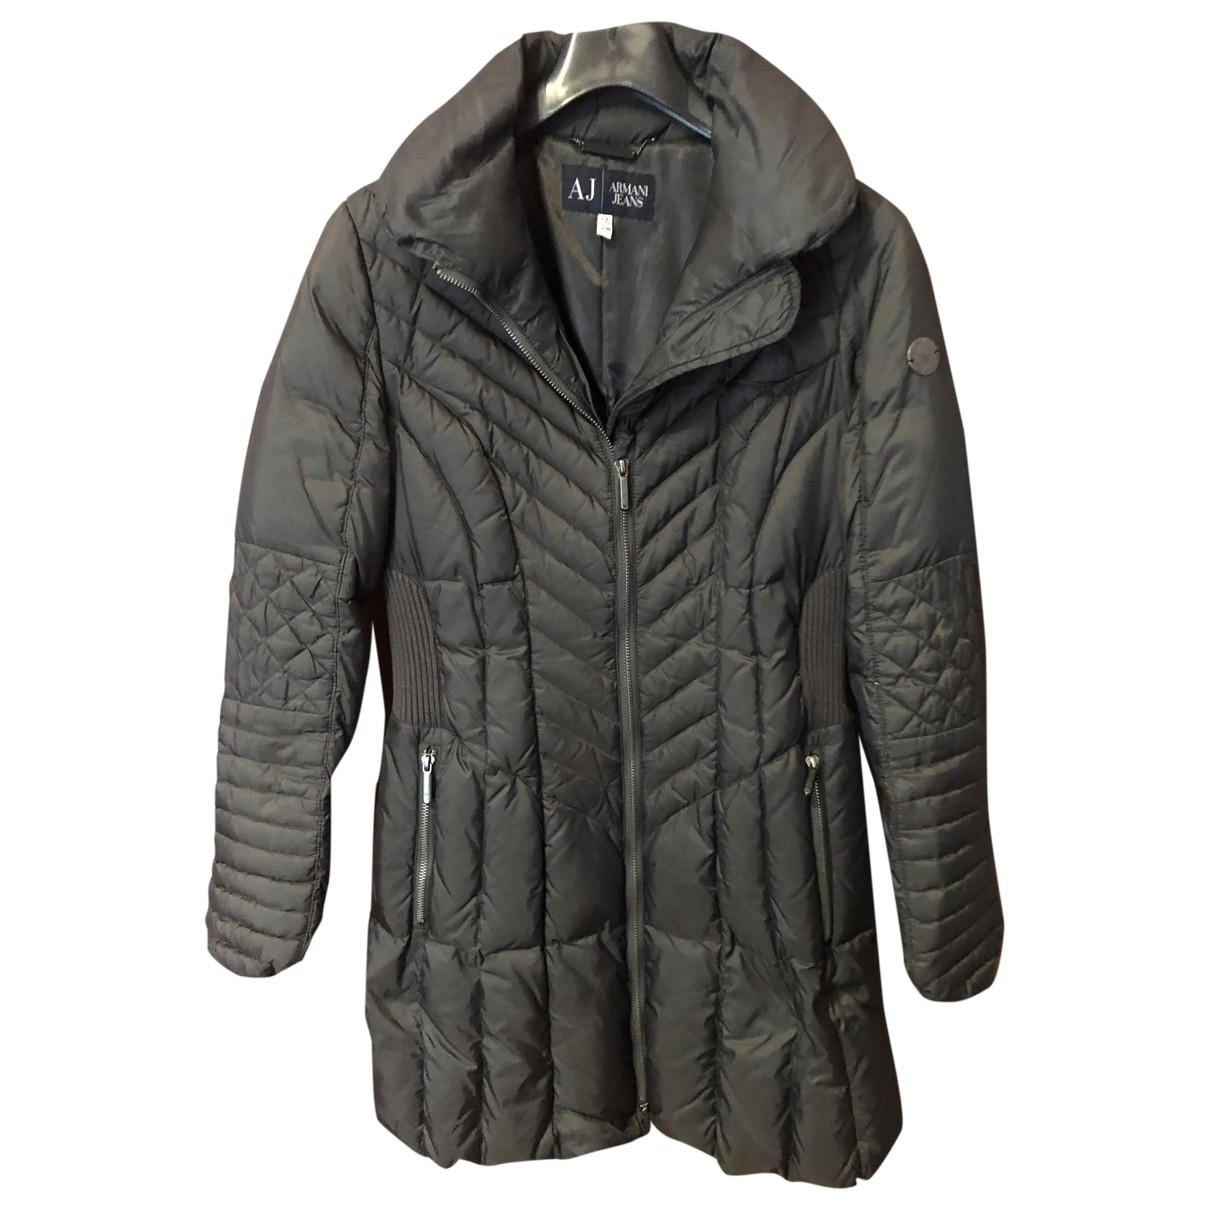 Armani Jeans \N Jacke in  Grau Polyester